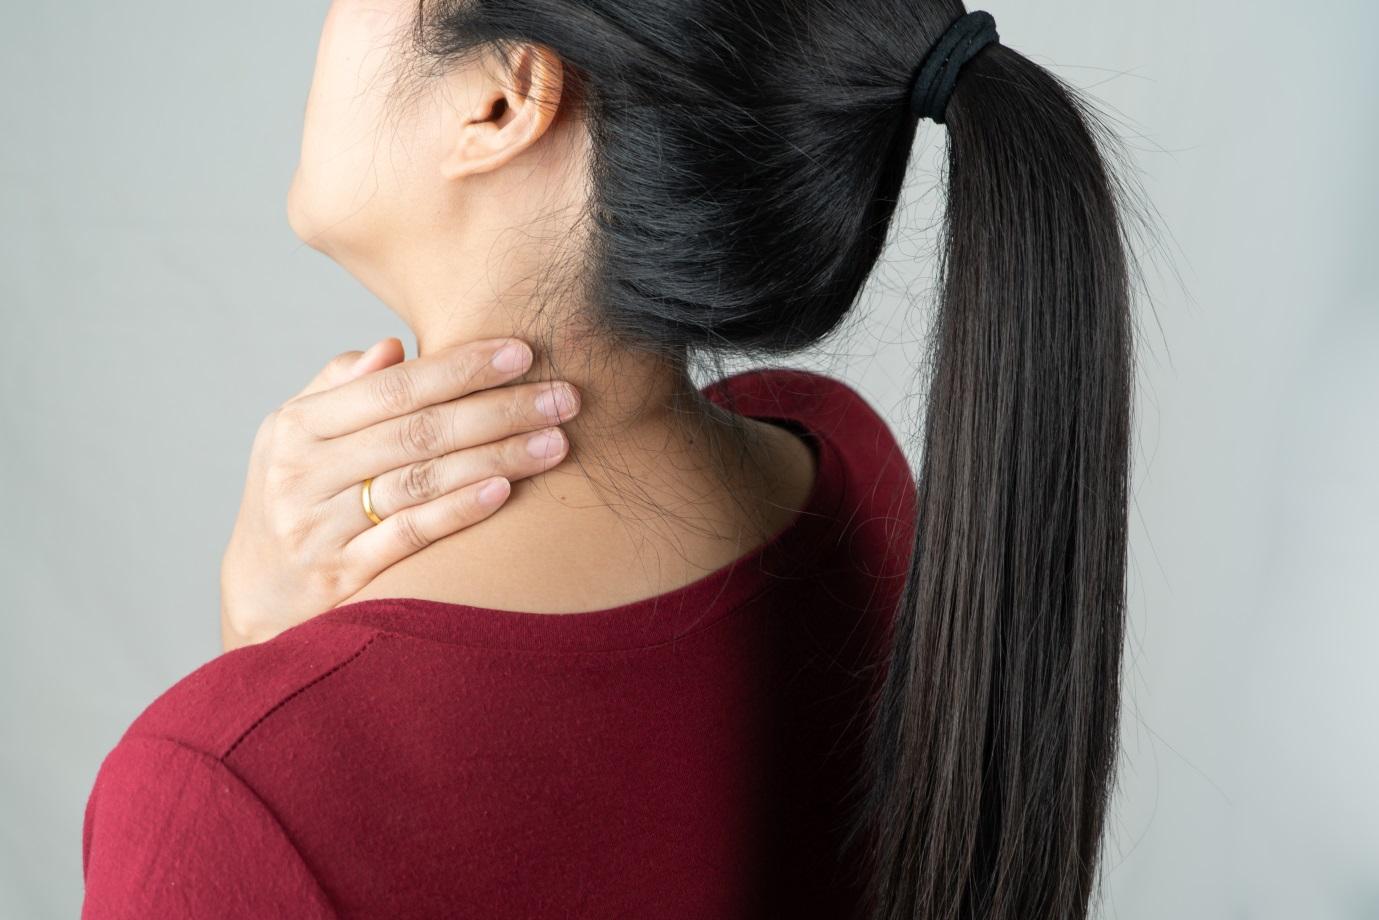 Kebiasaan Penyebab Sakit Pundak Leher Pegal Mana yang Paling Sering Anda Lakukan?